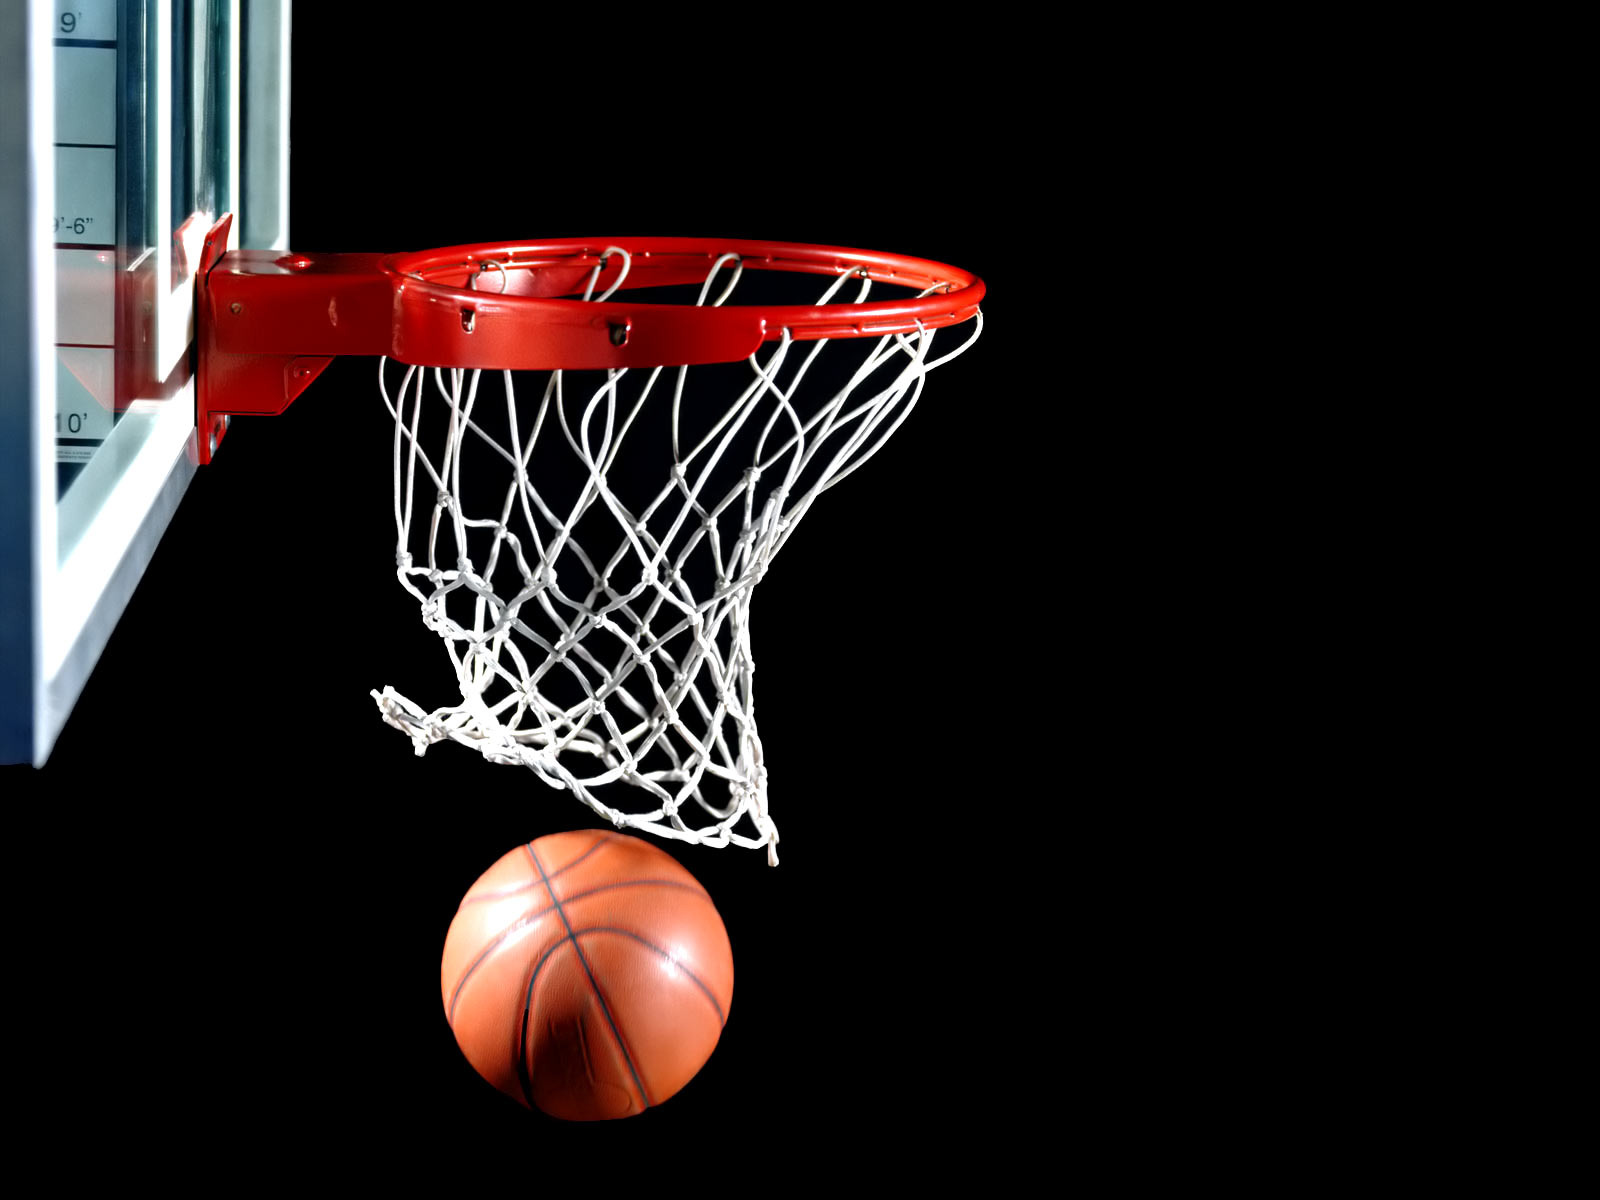 3b4bc6ecd11d9cb9c078_Basketball_Hoops.jpg